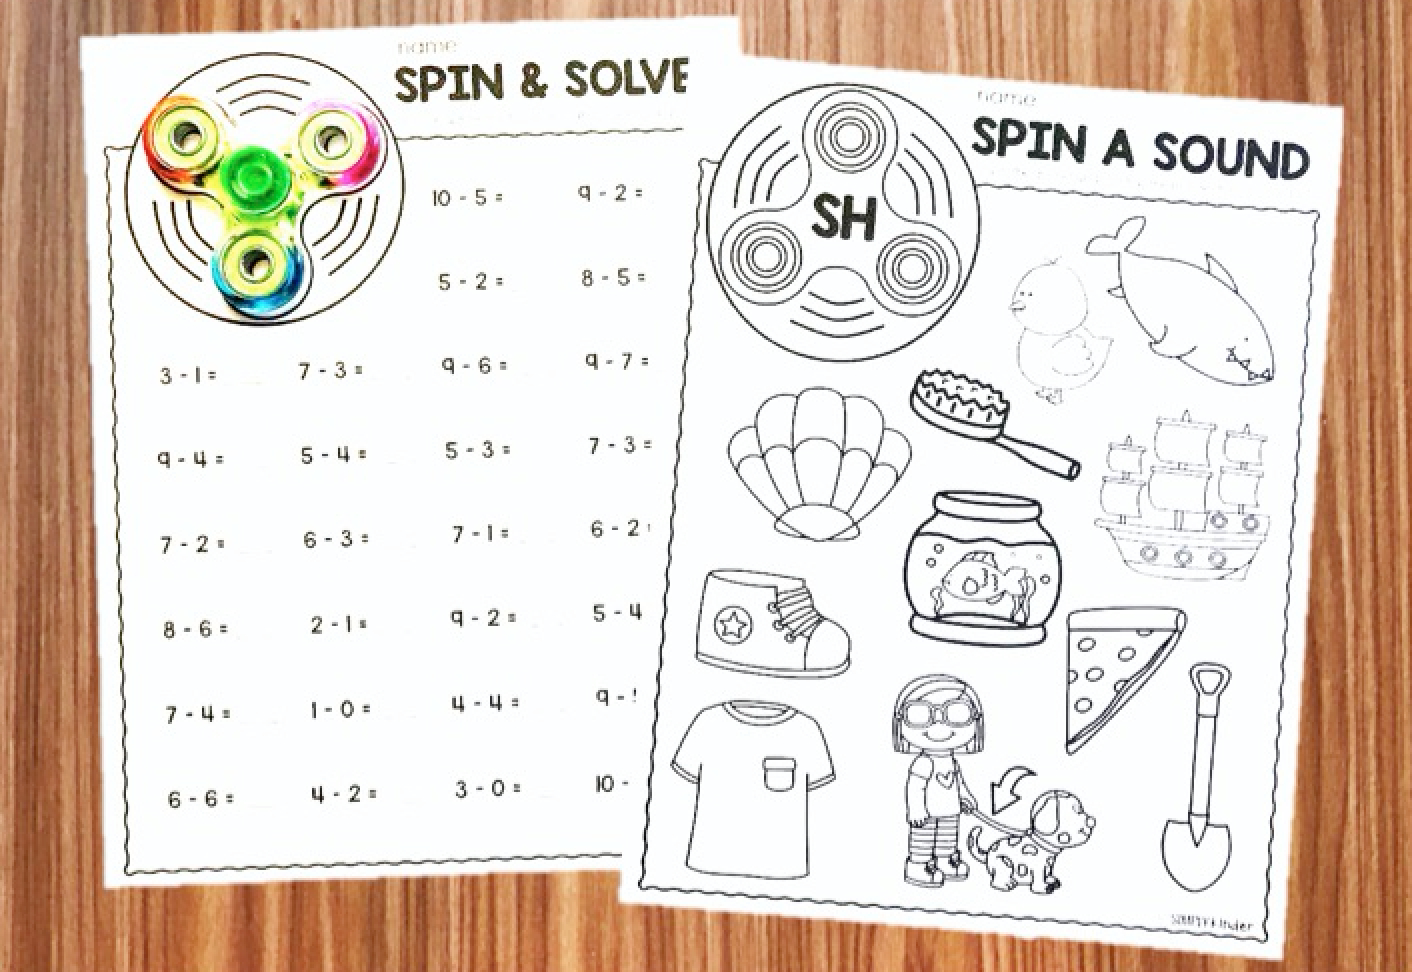 Fidget Spinner Activities For Kindergarten  Simply Kinder Throughout Fidget Spinner Worksheets